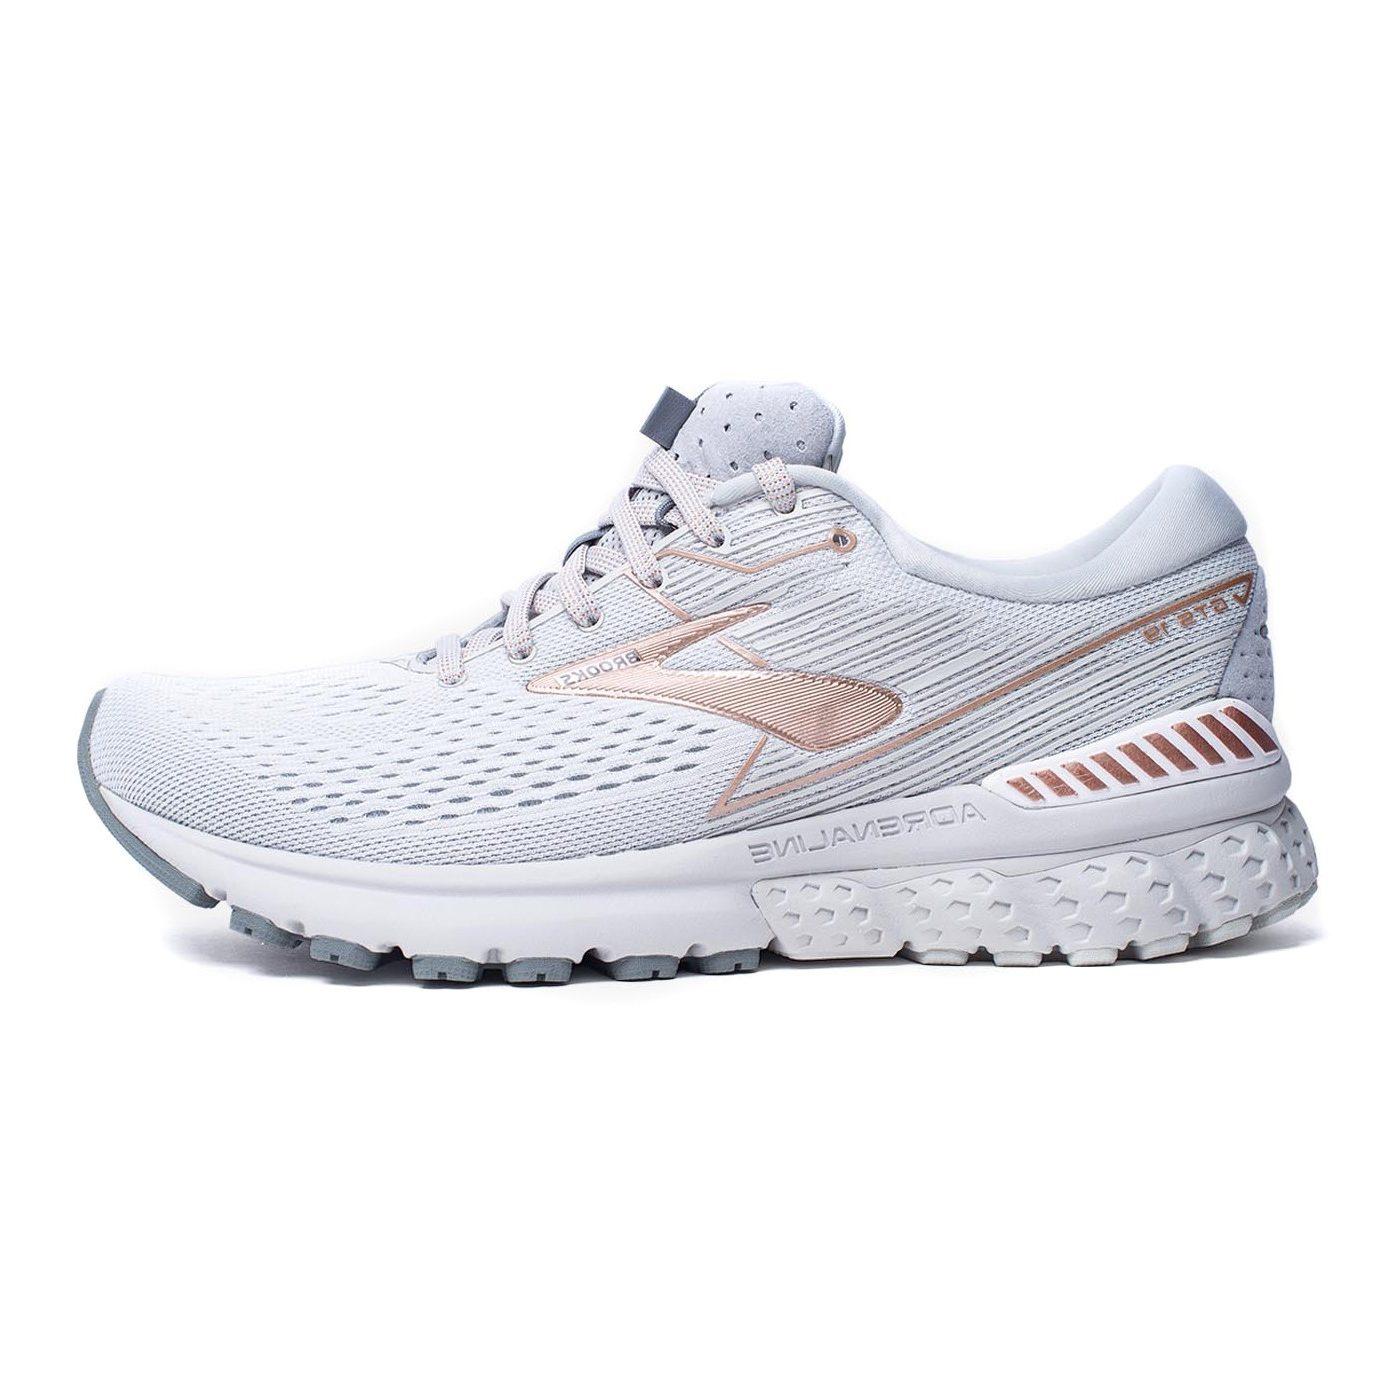 Adrenaline-GTS-19-4-e1615048109768 +80 Most Inspiring Workout Shoes Ideas for Women